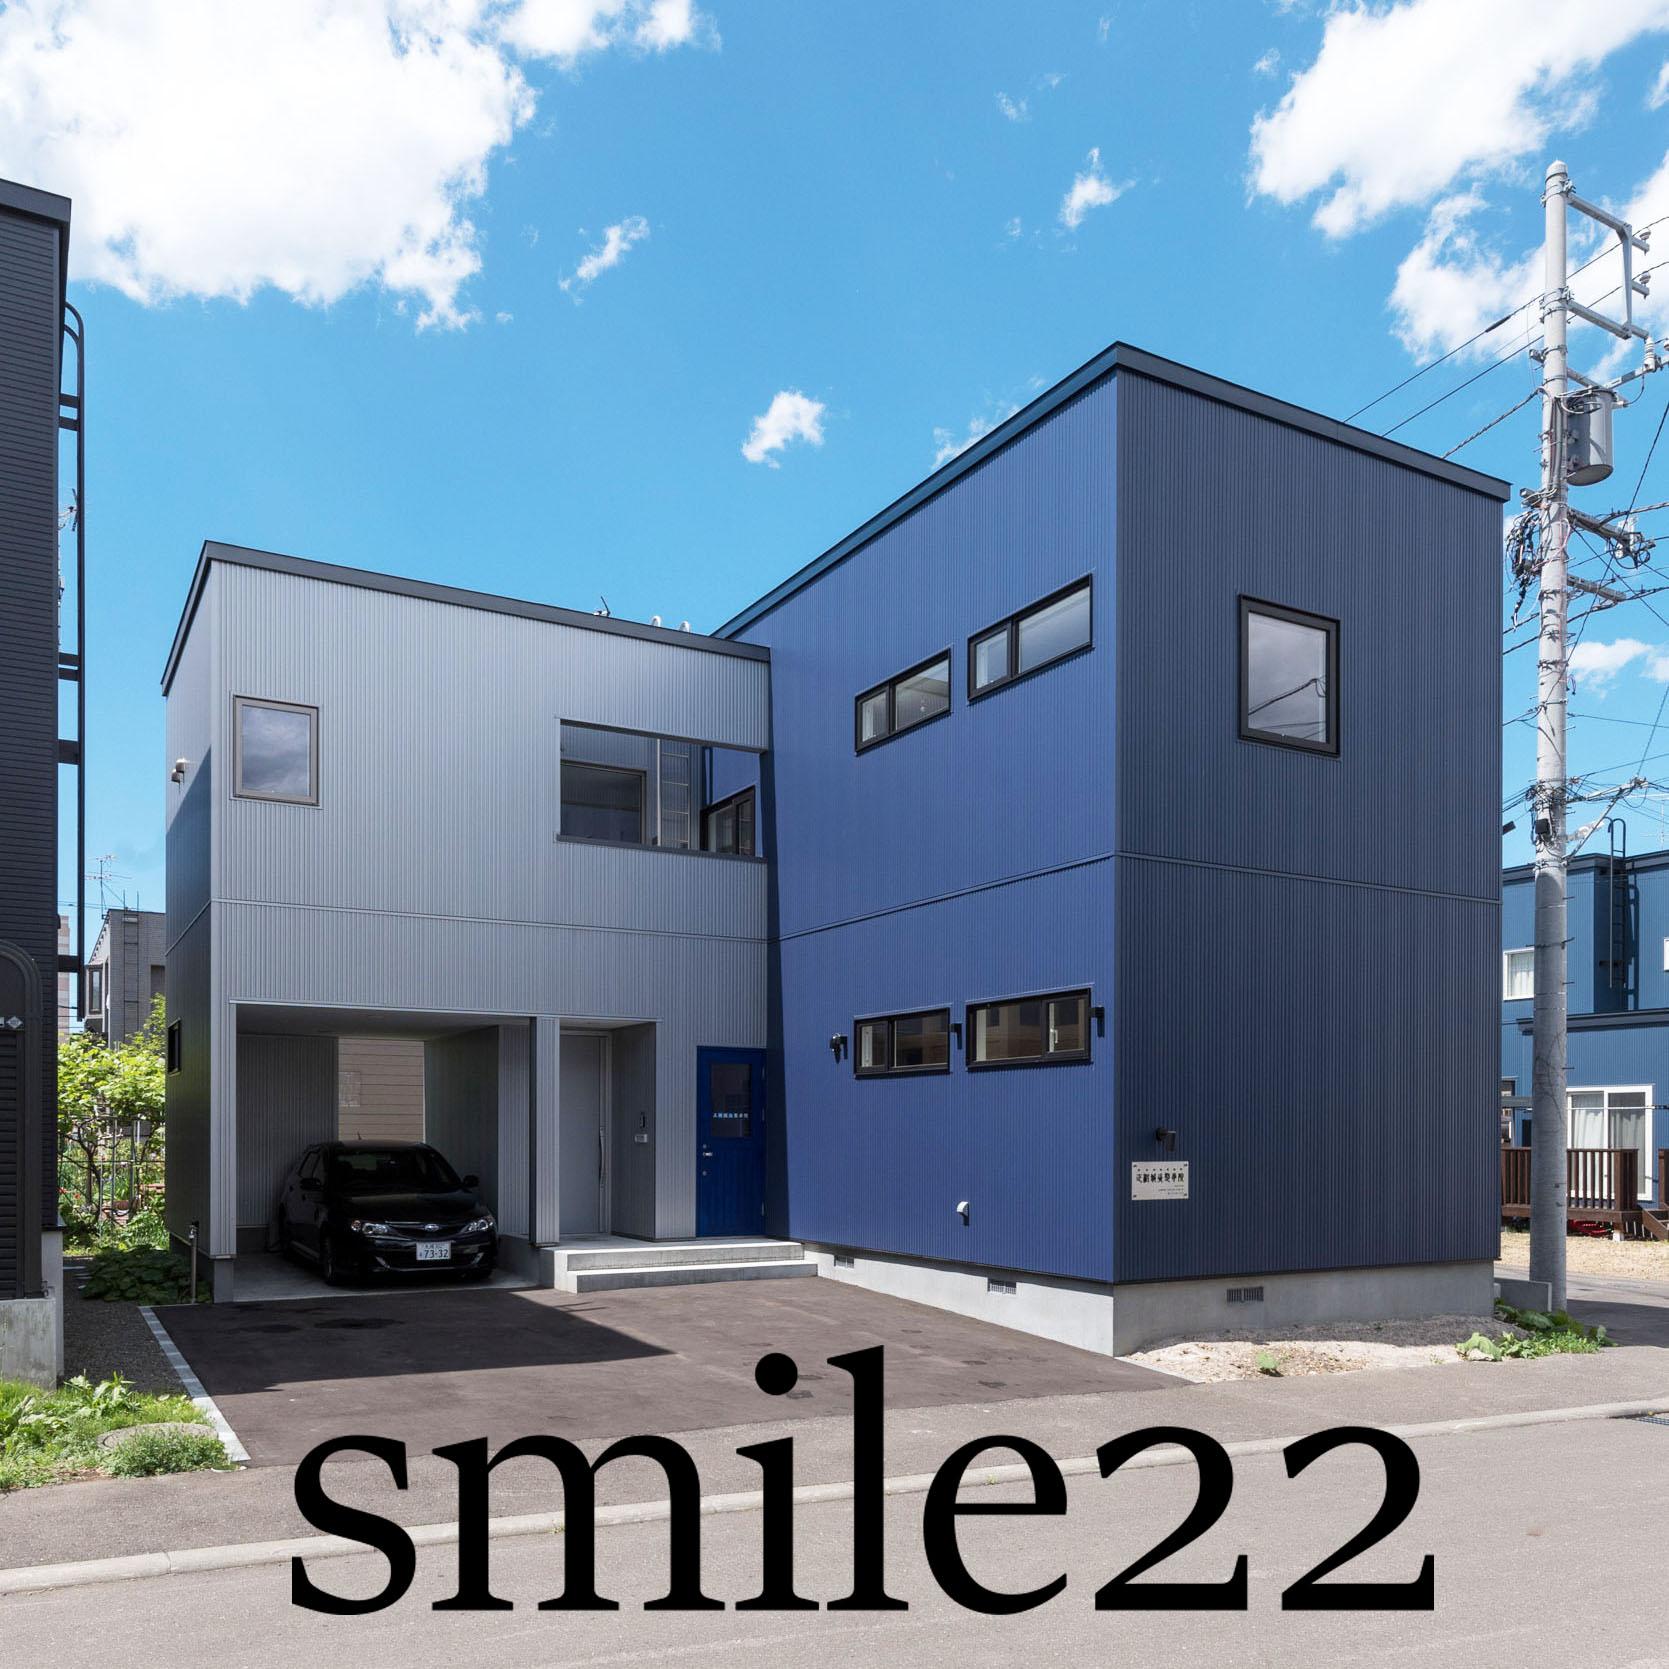 smile22(スマイル22)